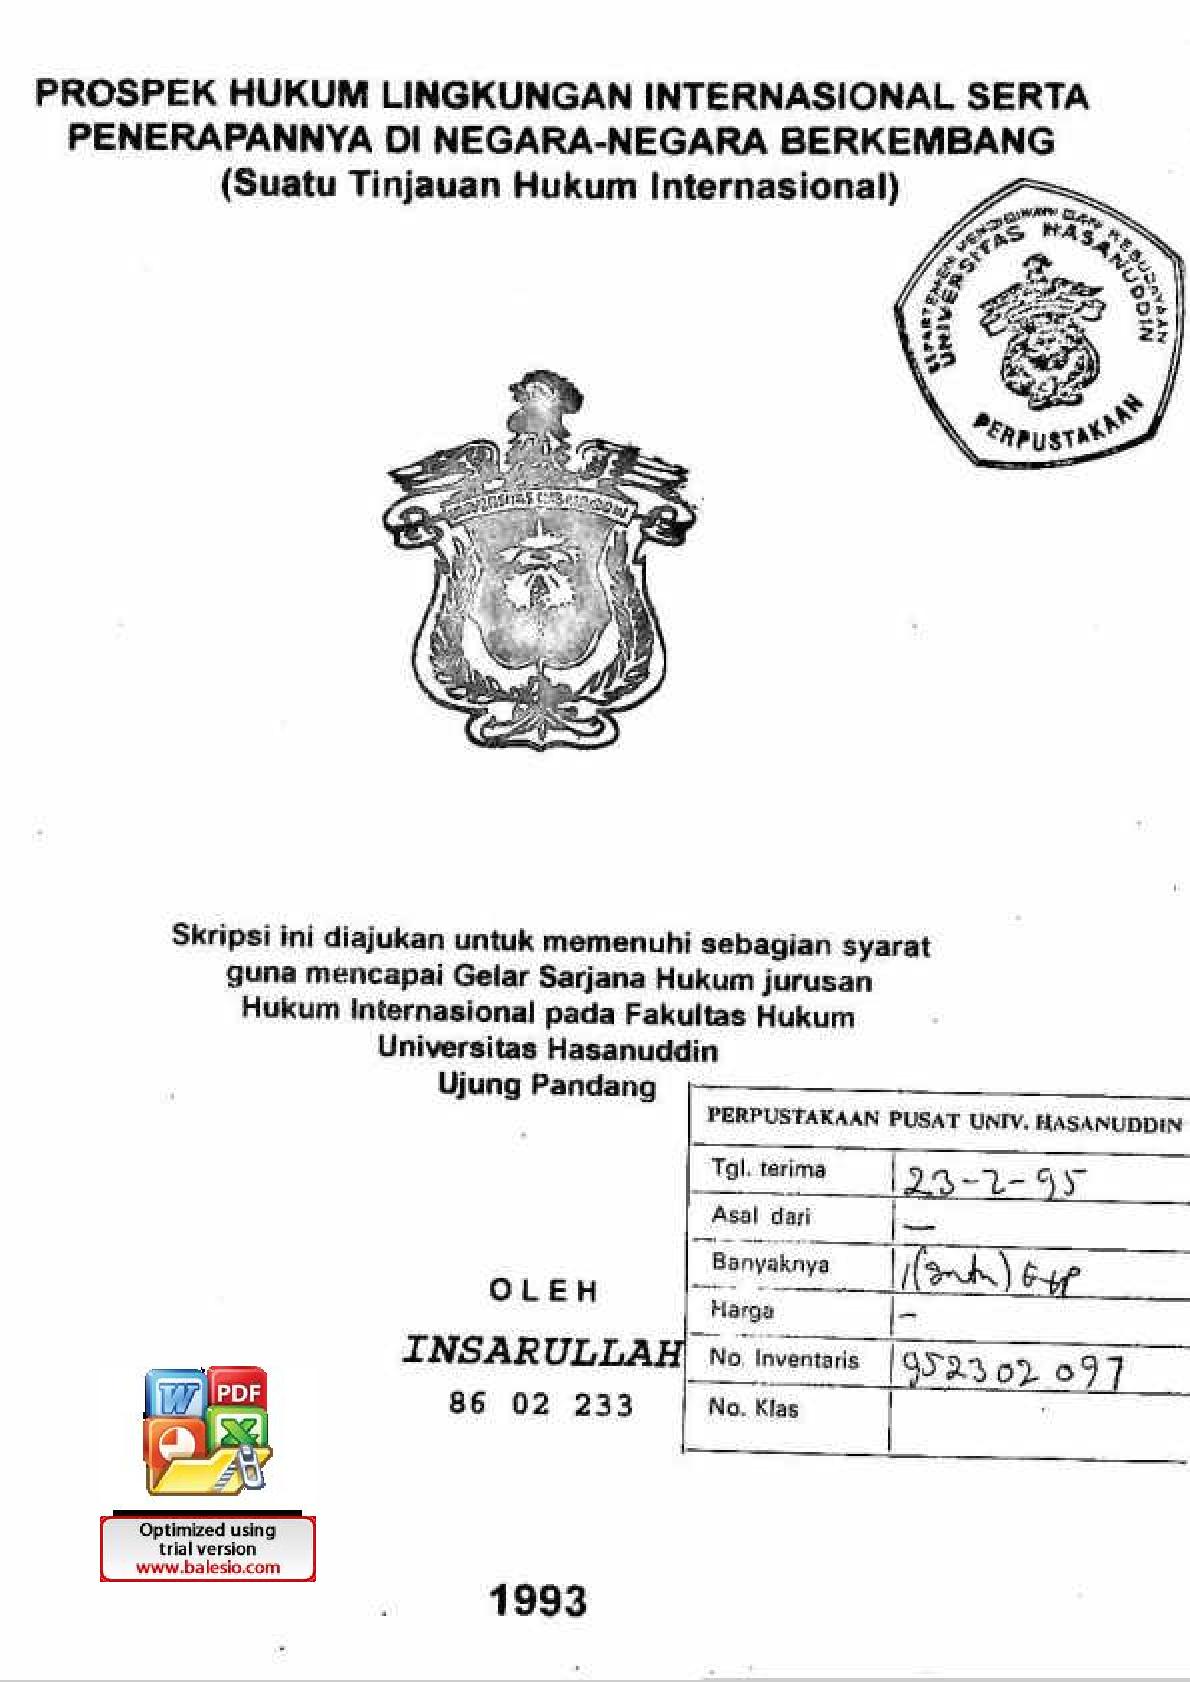 Prospek Hukum Lingkungan Internasional Serta Penerapannya Di Negara Negara Berkembang Suatu Tinjauan Hukum Internasional Insarullah Perpustakaan Universitas Hasanuddin